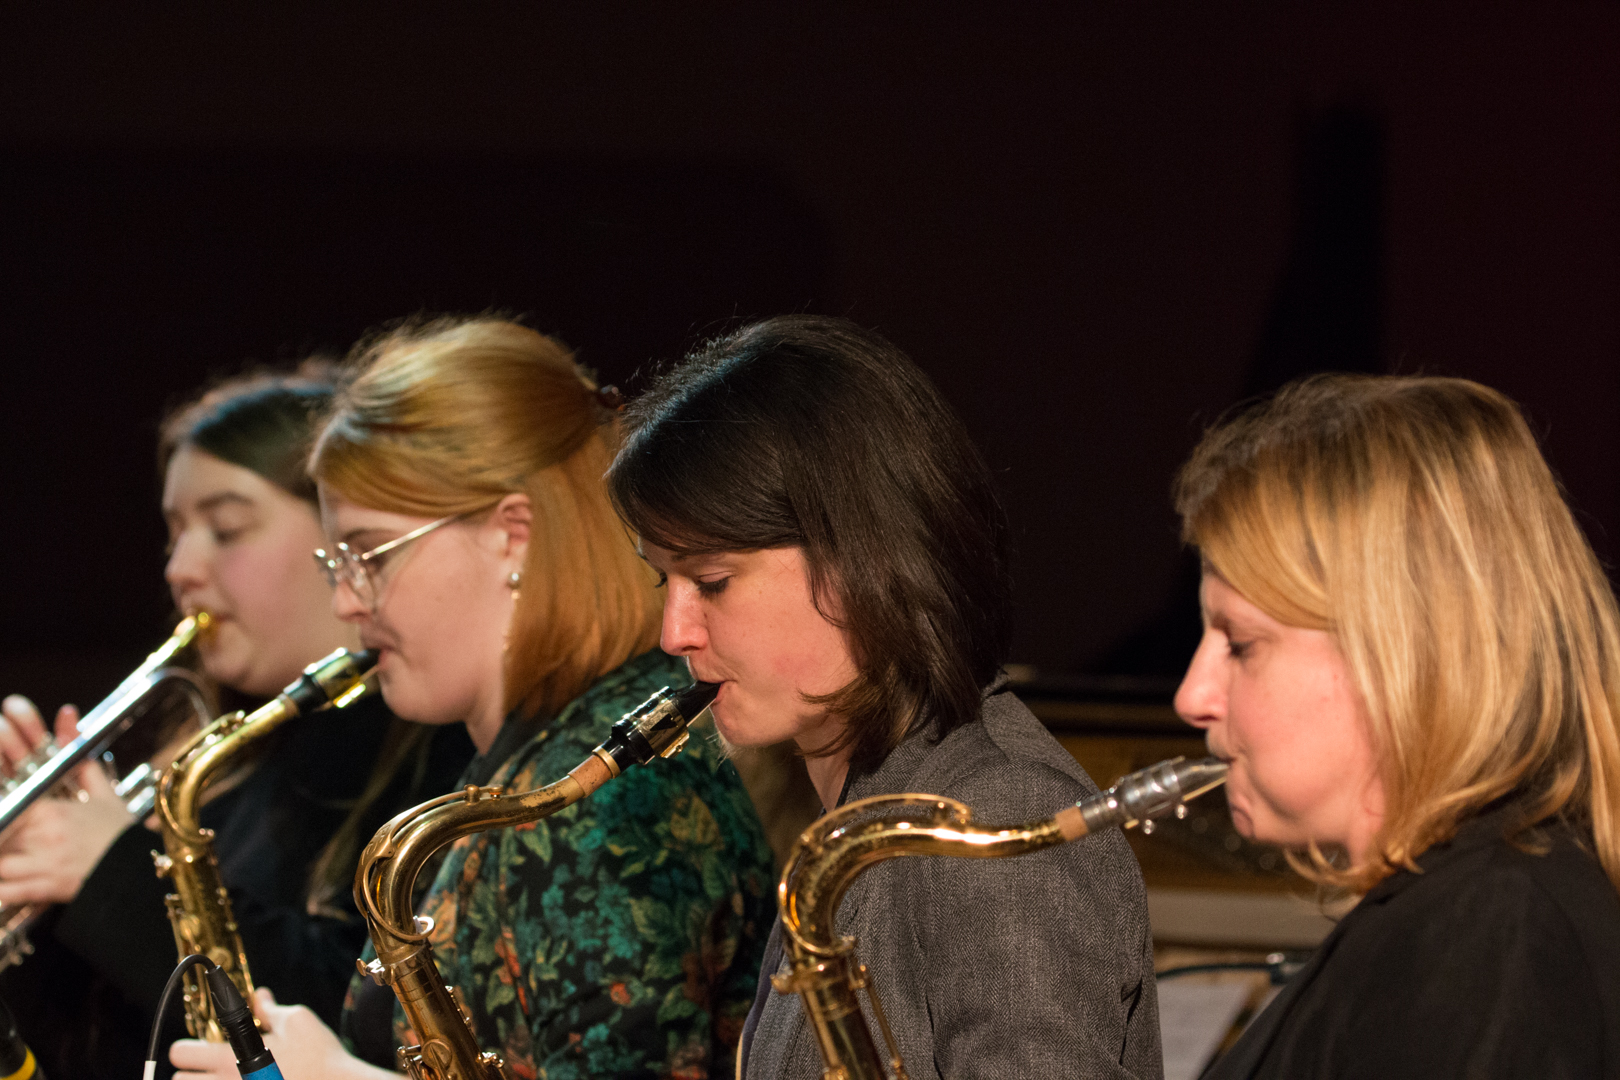 Nikki Iles All Star Septet at Fleet Jazz on 19th Feb 2019